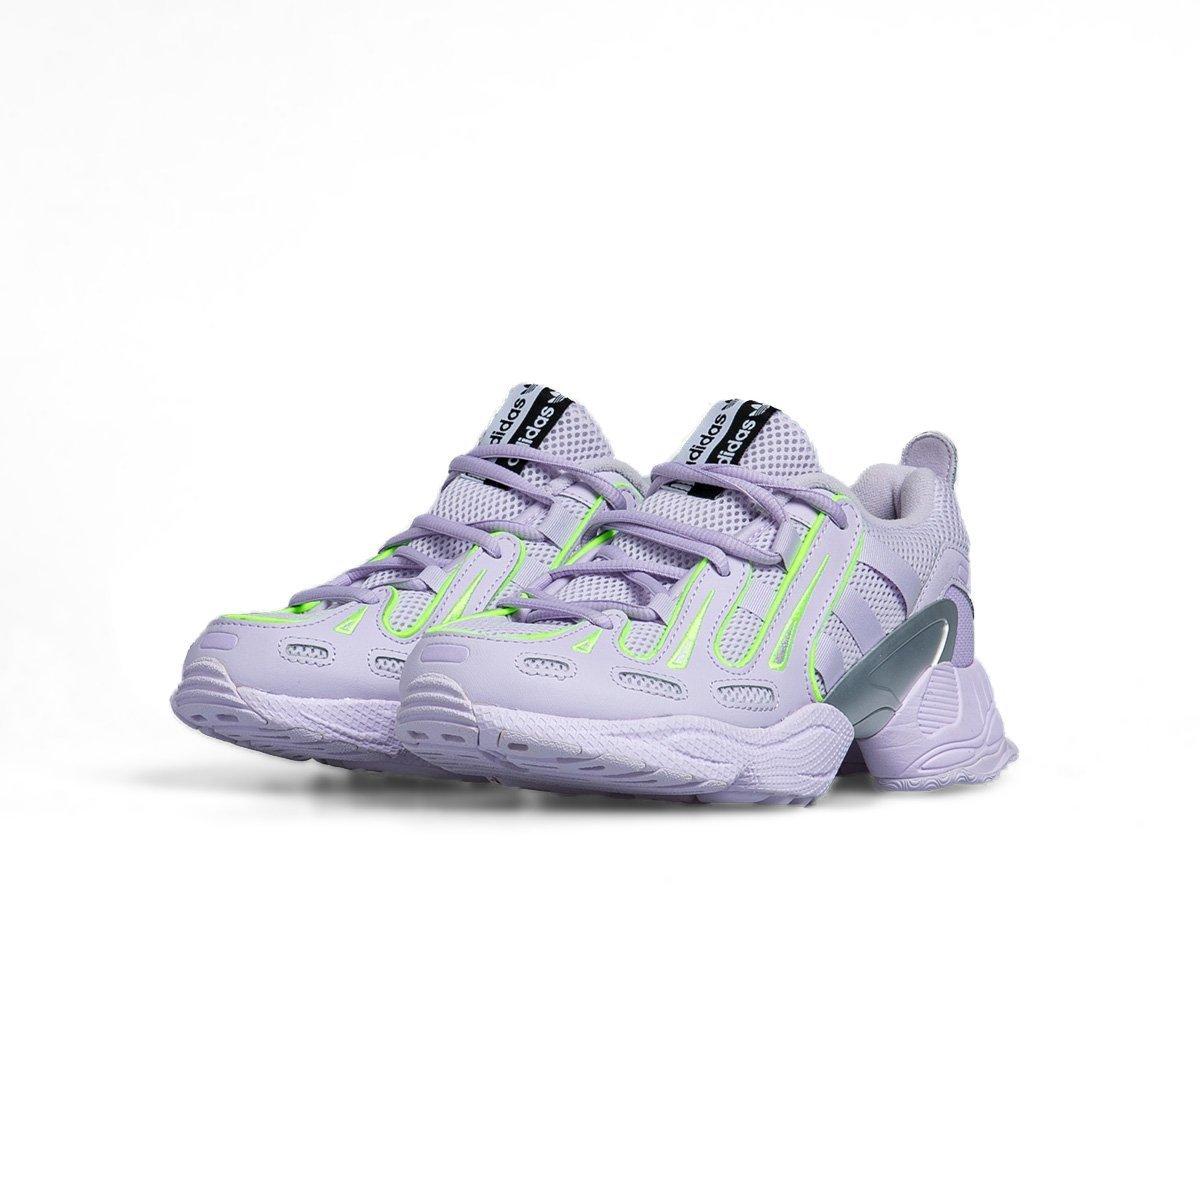 Sneakers buty damskie Adidas Originals EQT Gazelle fioletowe (EF5322)